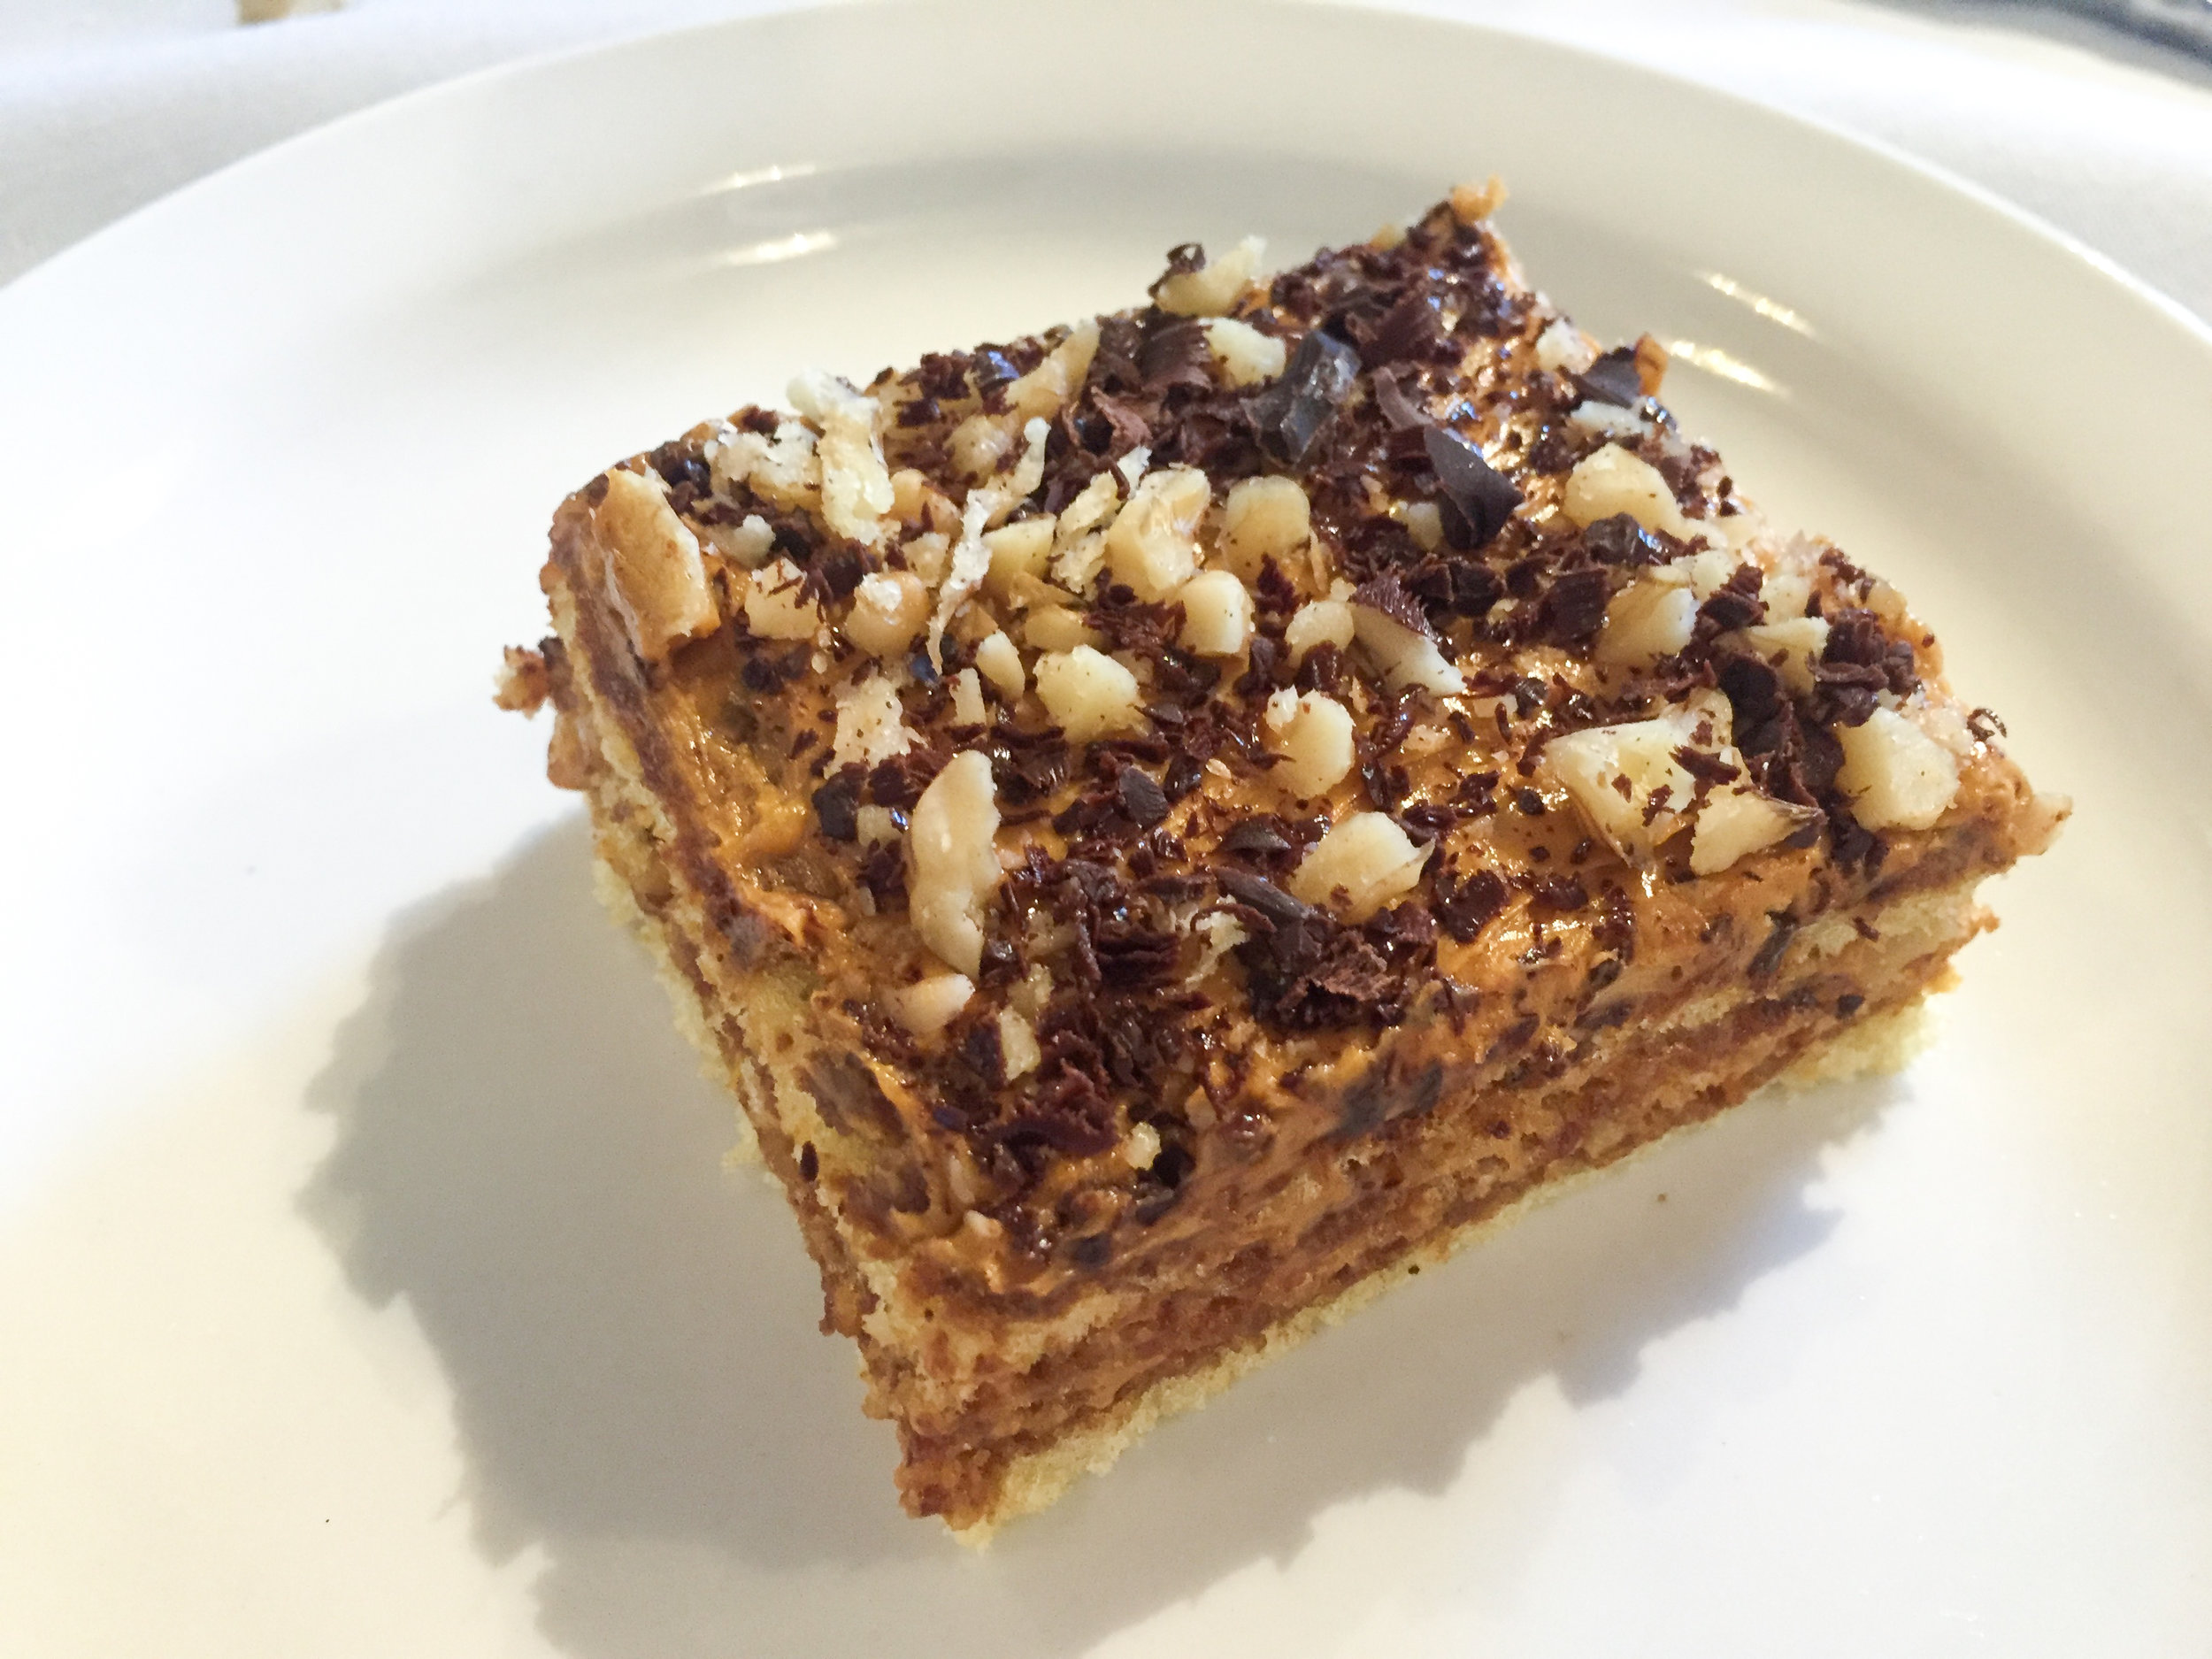 ararat17-matthews-charlotte-nc-armenian-restaurant-chefs-special-dessert